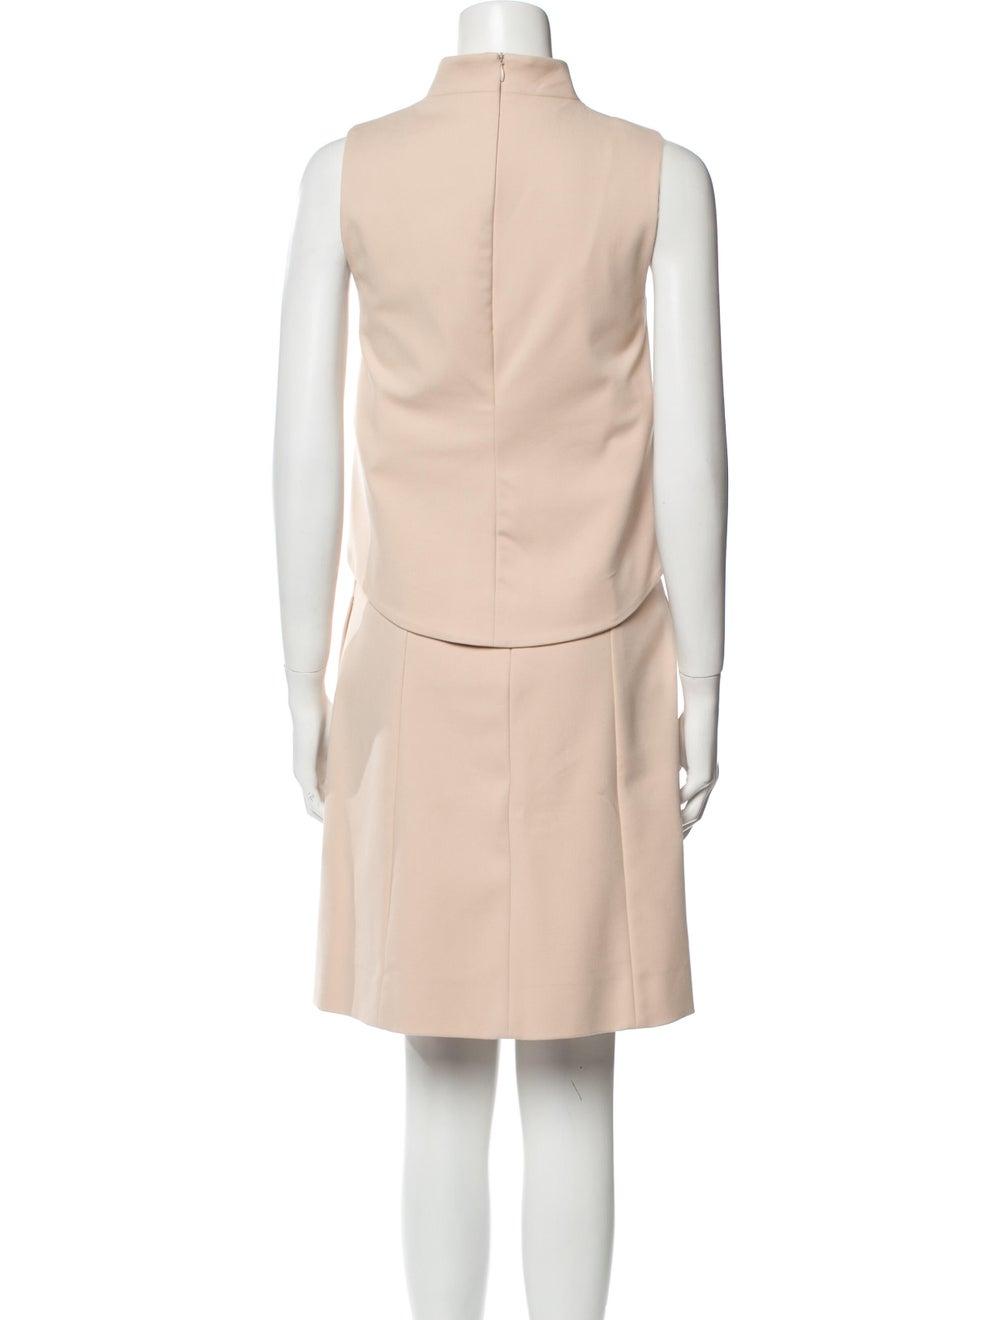 Tibi Skirt Set Brown - image 3